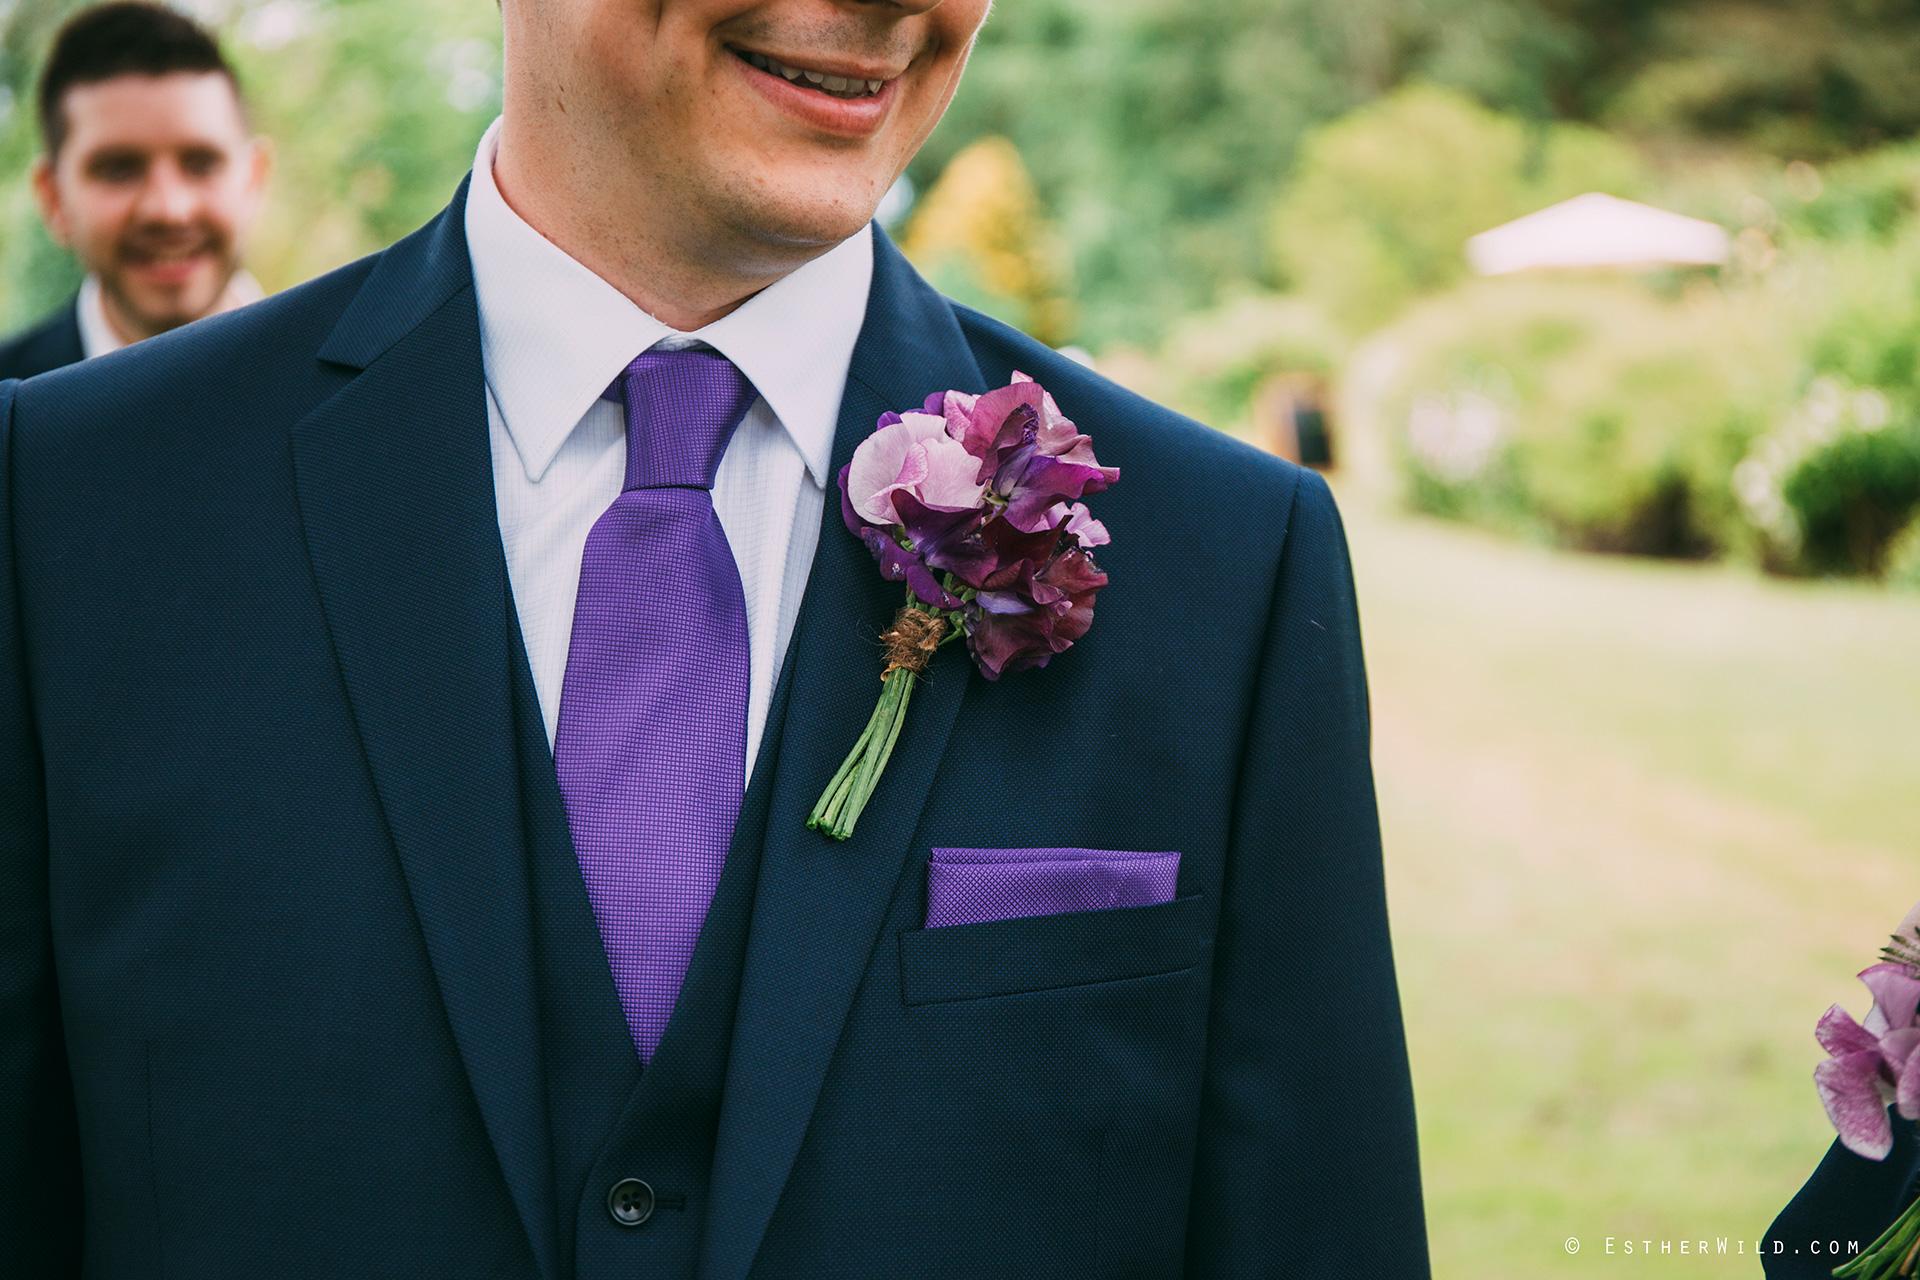 Norfolk_Wedding_Photographer_Mannington_Hall_Country_Esther_Wild_9997.jpg